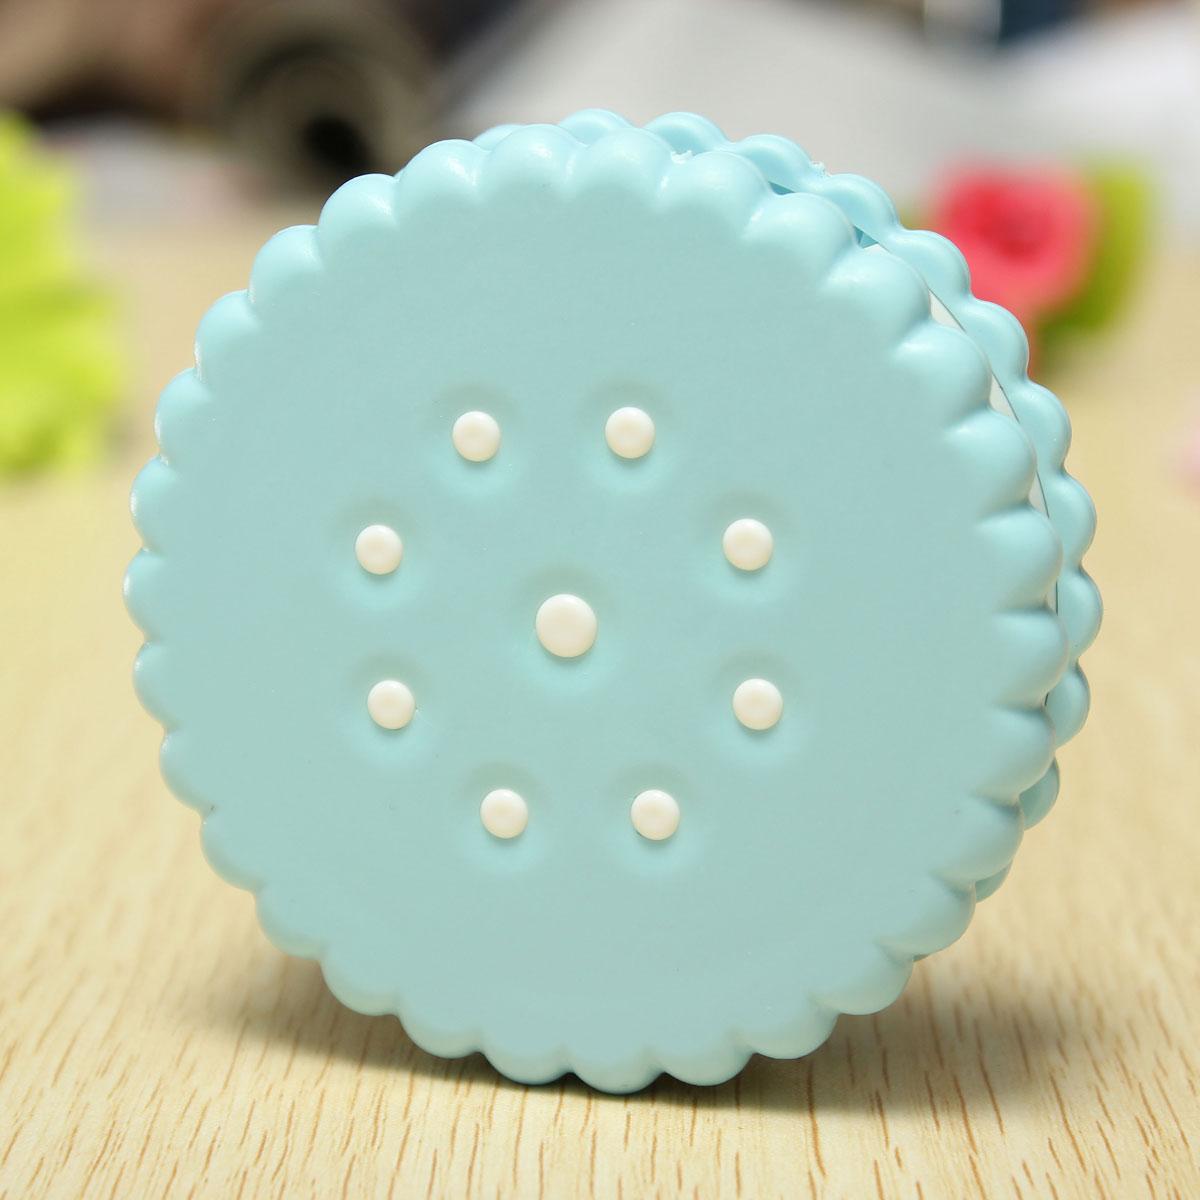 Cute Biscuit Contact Lens Case Simulating Cookie Cake Lenses Box Storage Set UK